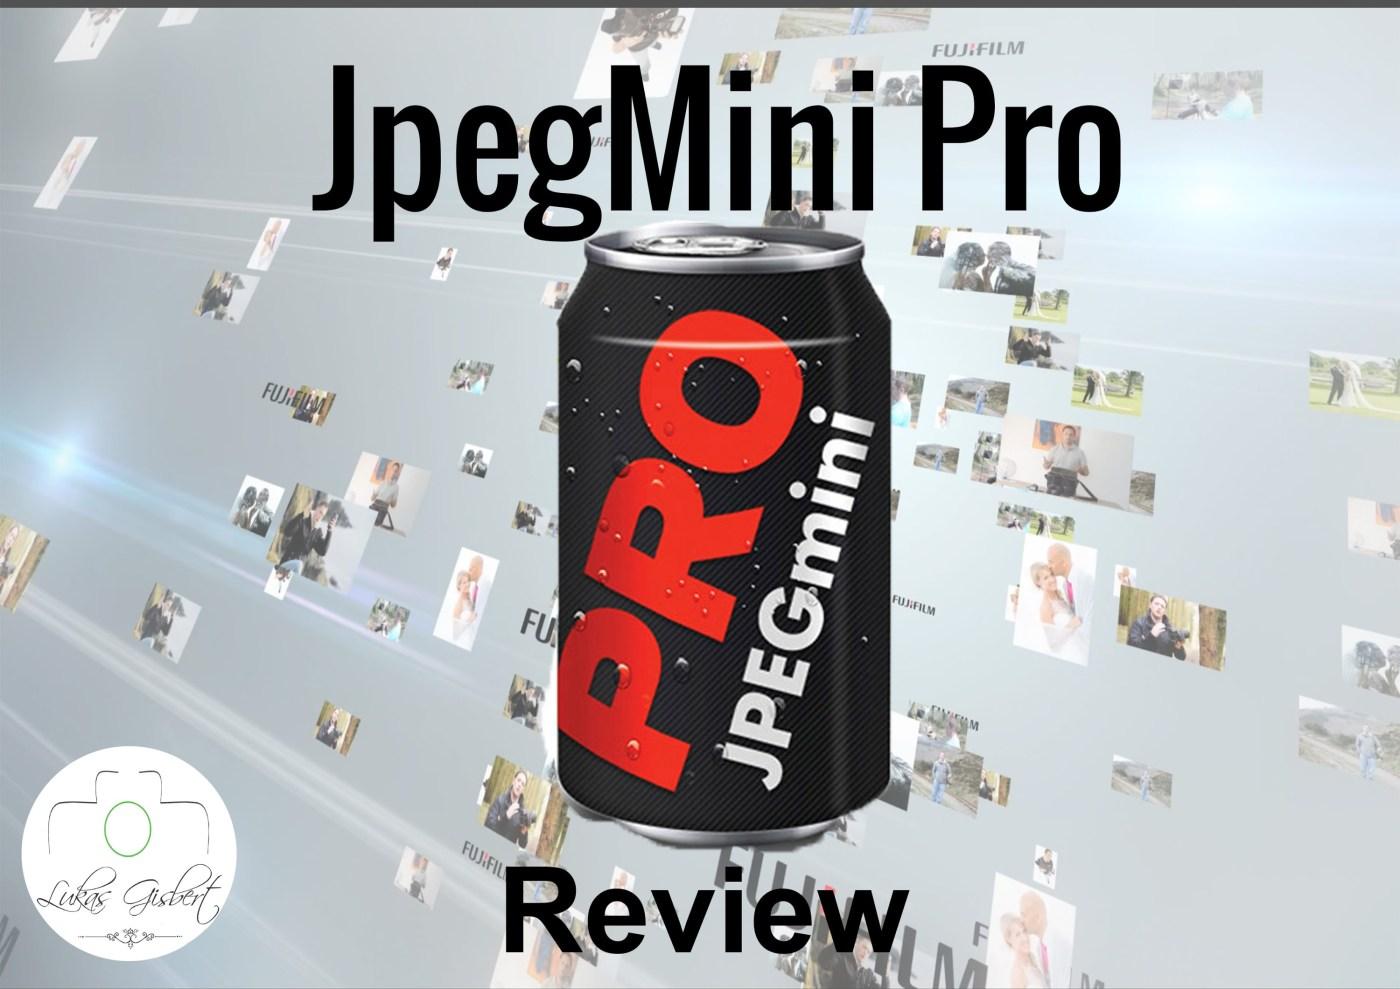 JPEGmini Pro 2.1.0.0 Full Free Crack With Activation Key